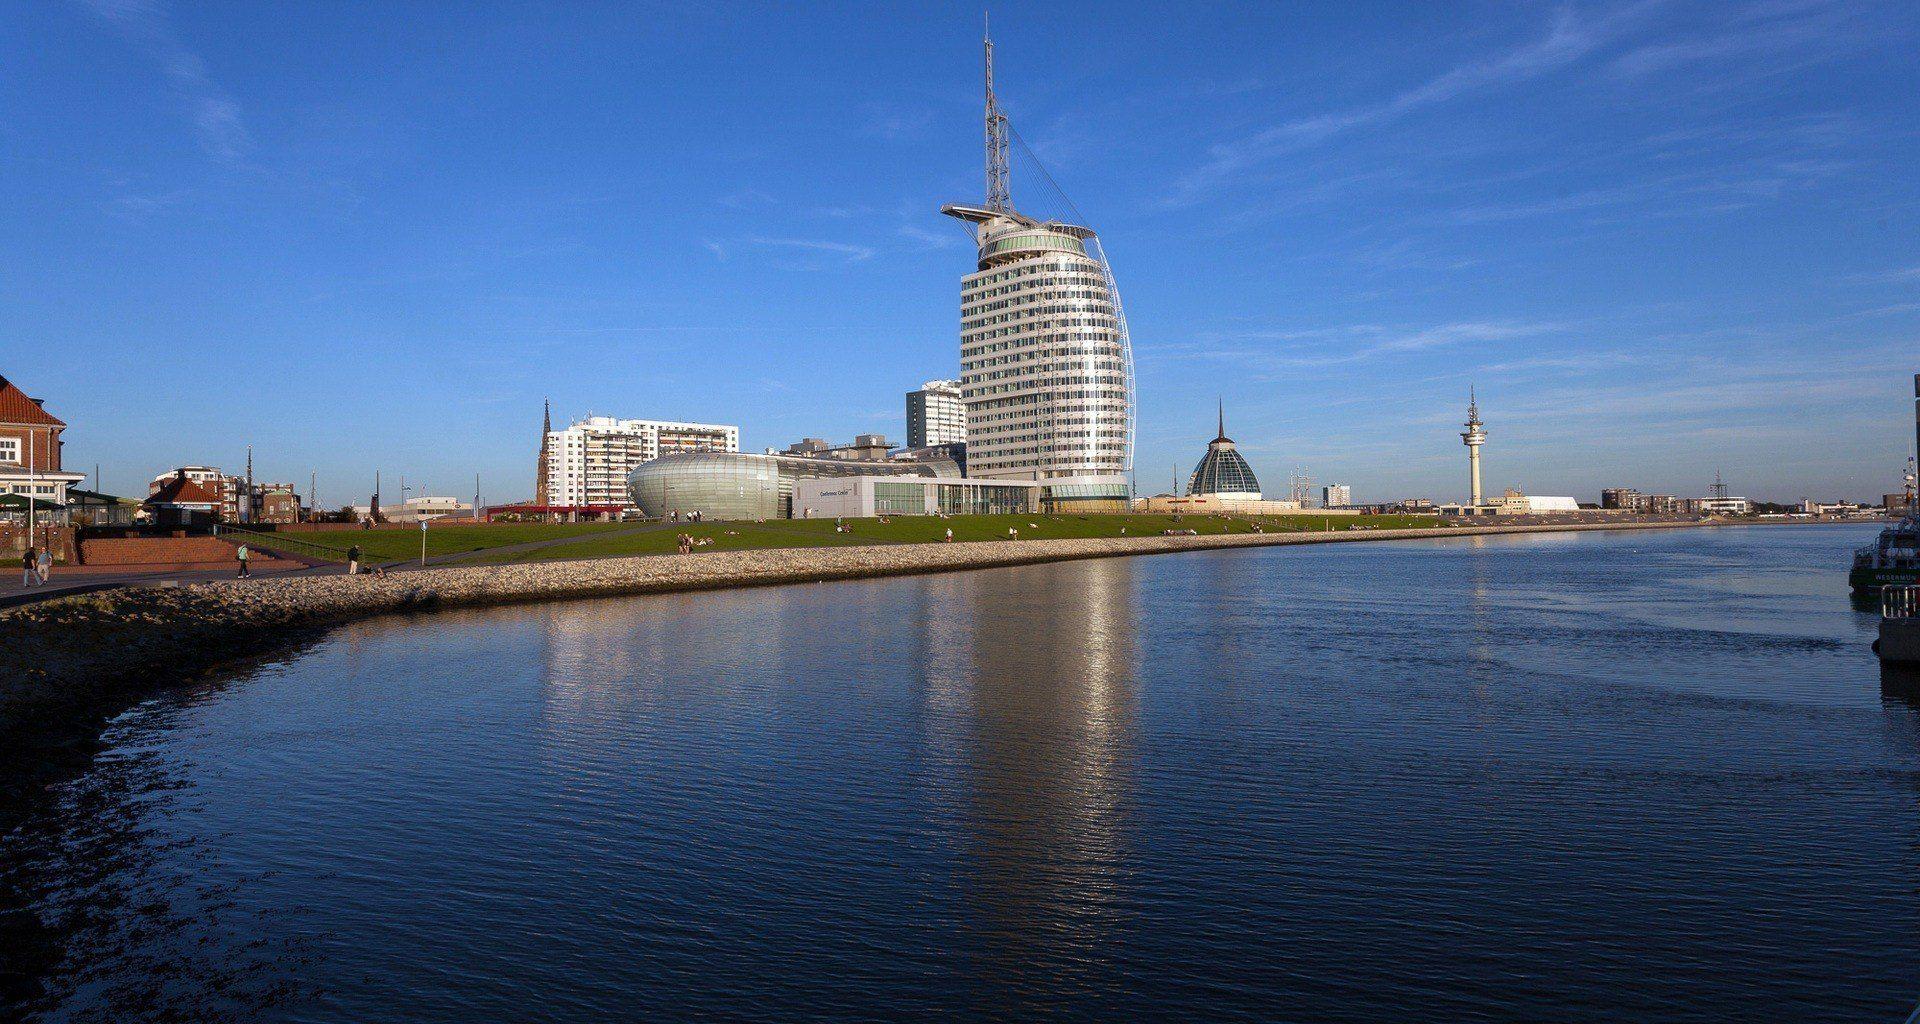 Dirne Bremerhaven, Stadtgemeinde